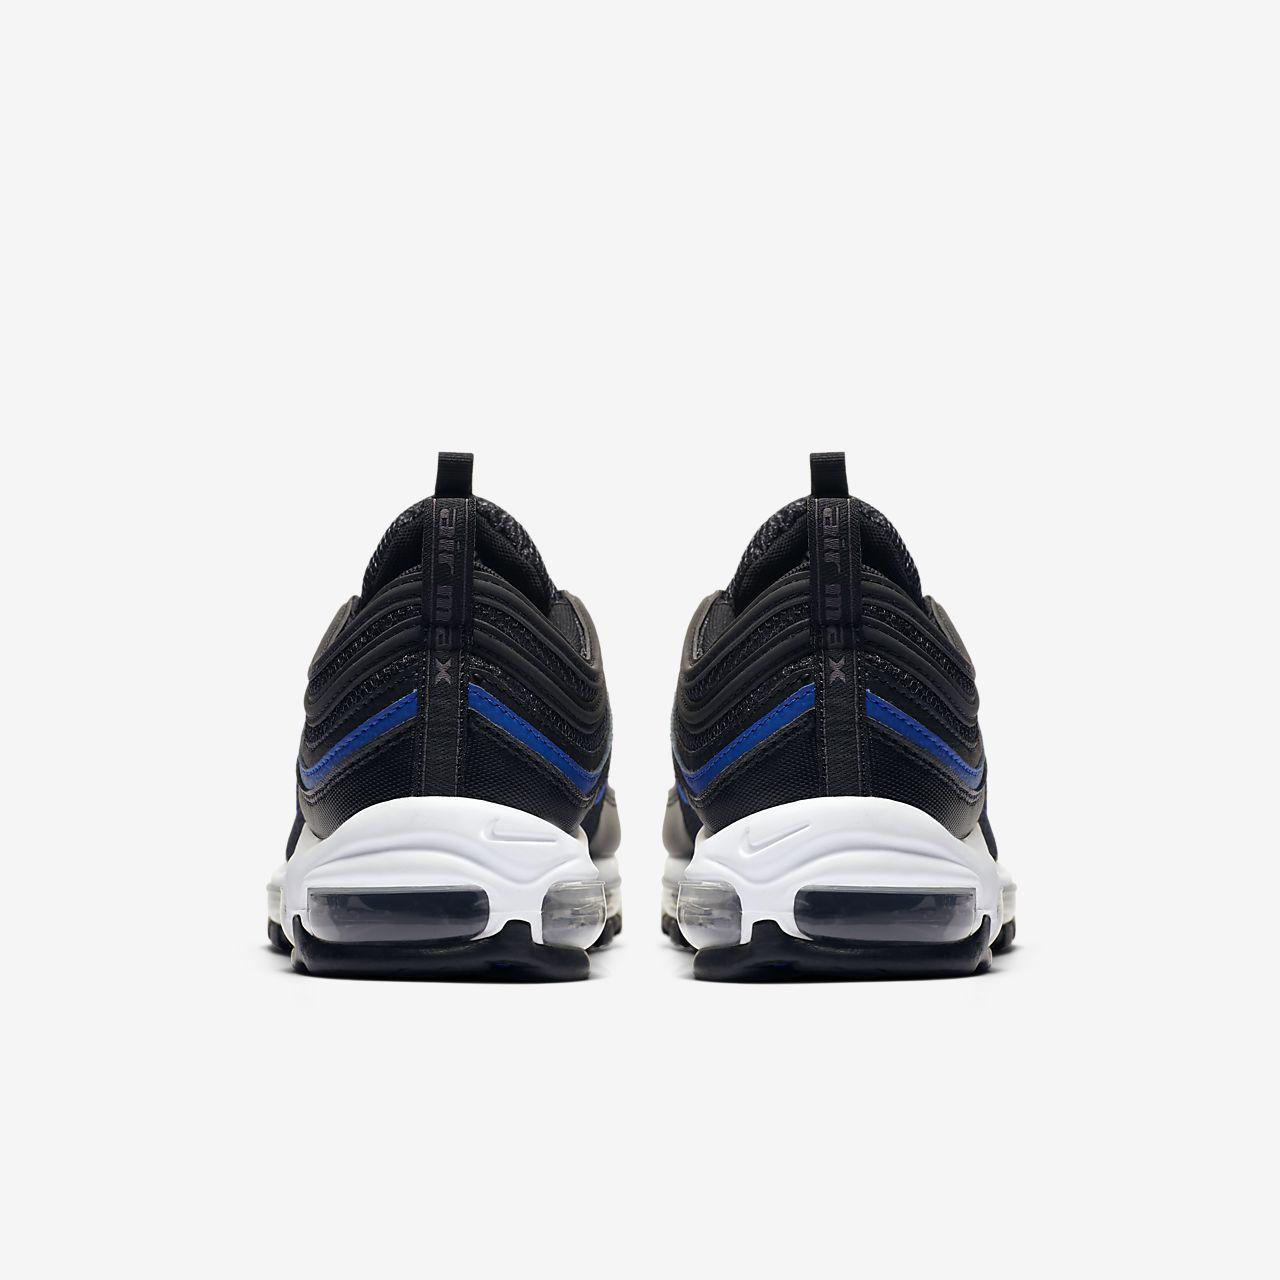 05929b554f scarpa nike air max 97 og anthracite/racer blue/nero ar5531-001